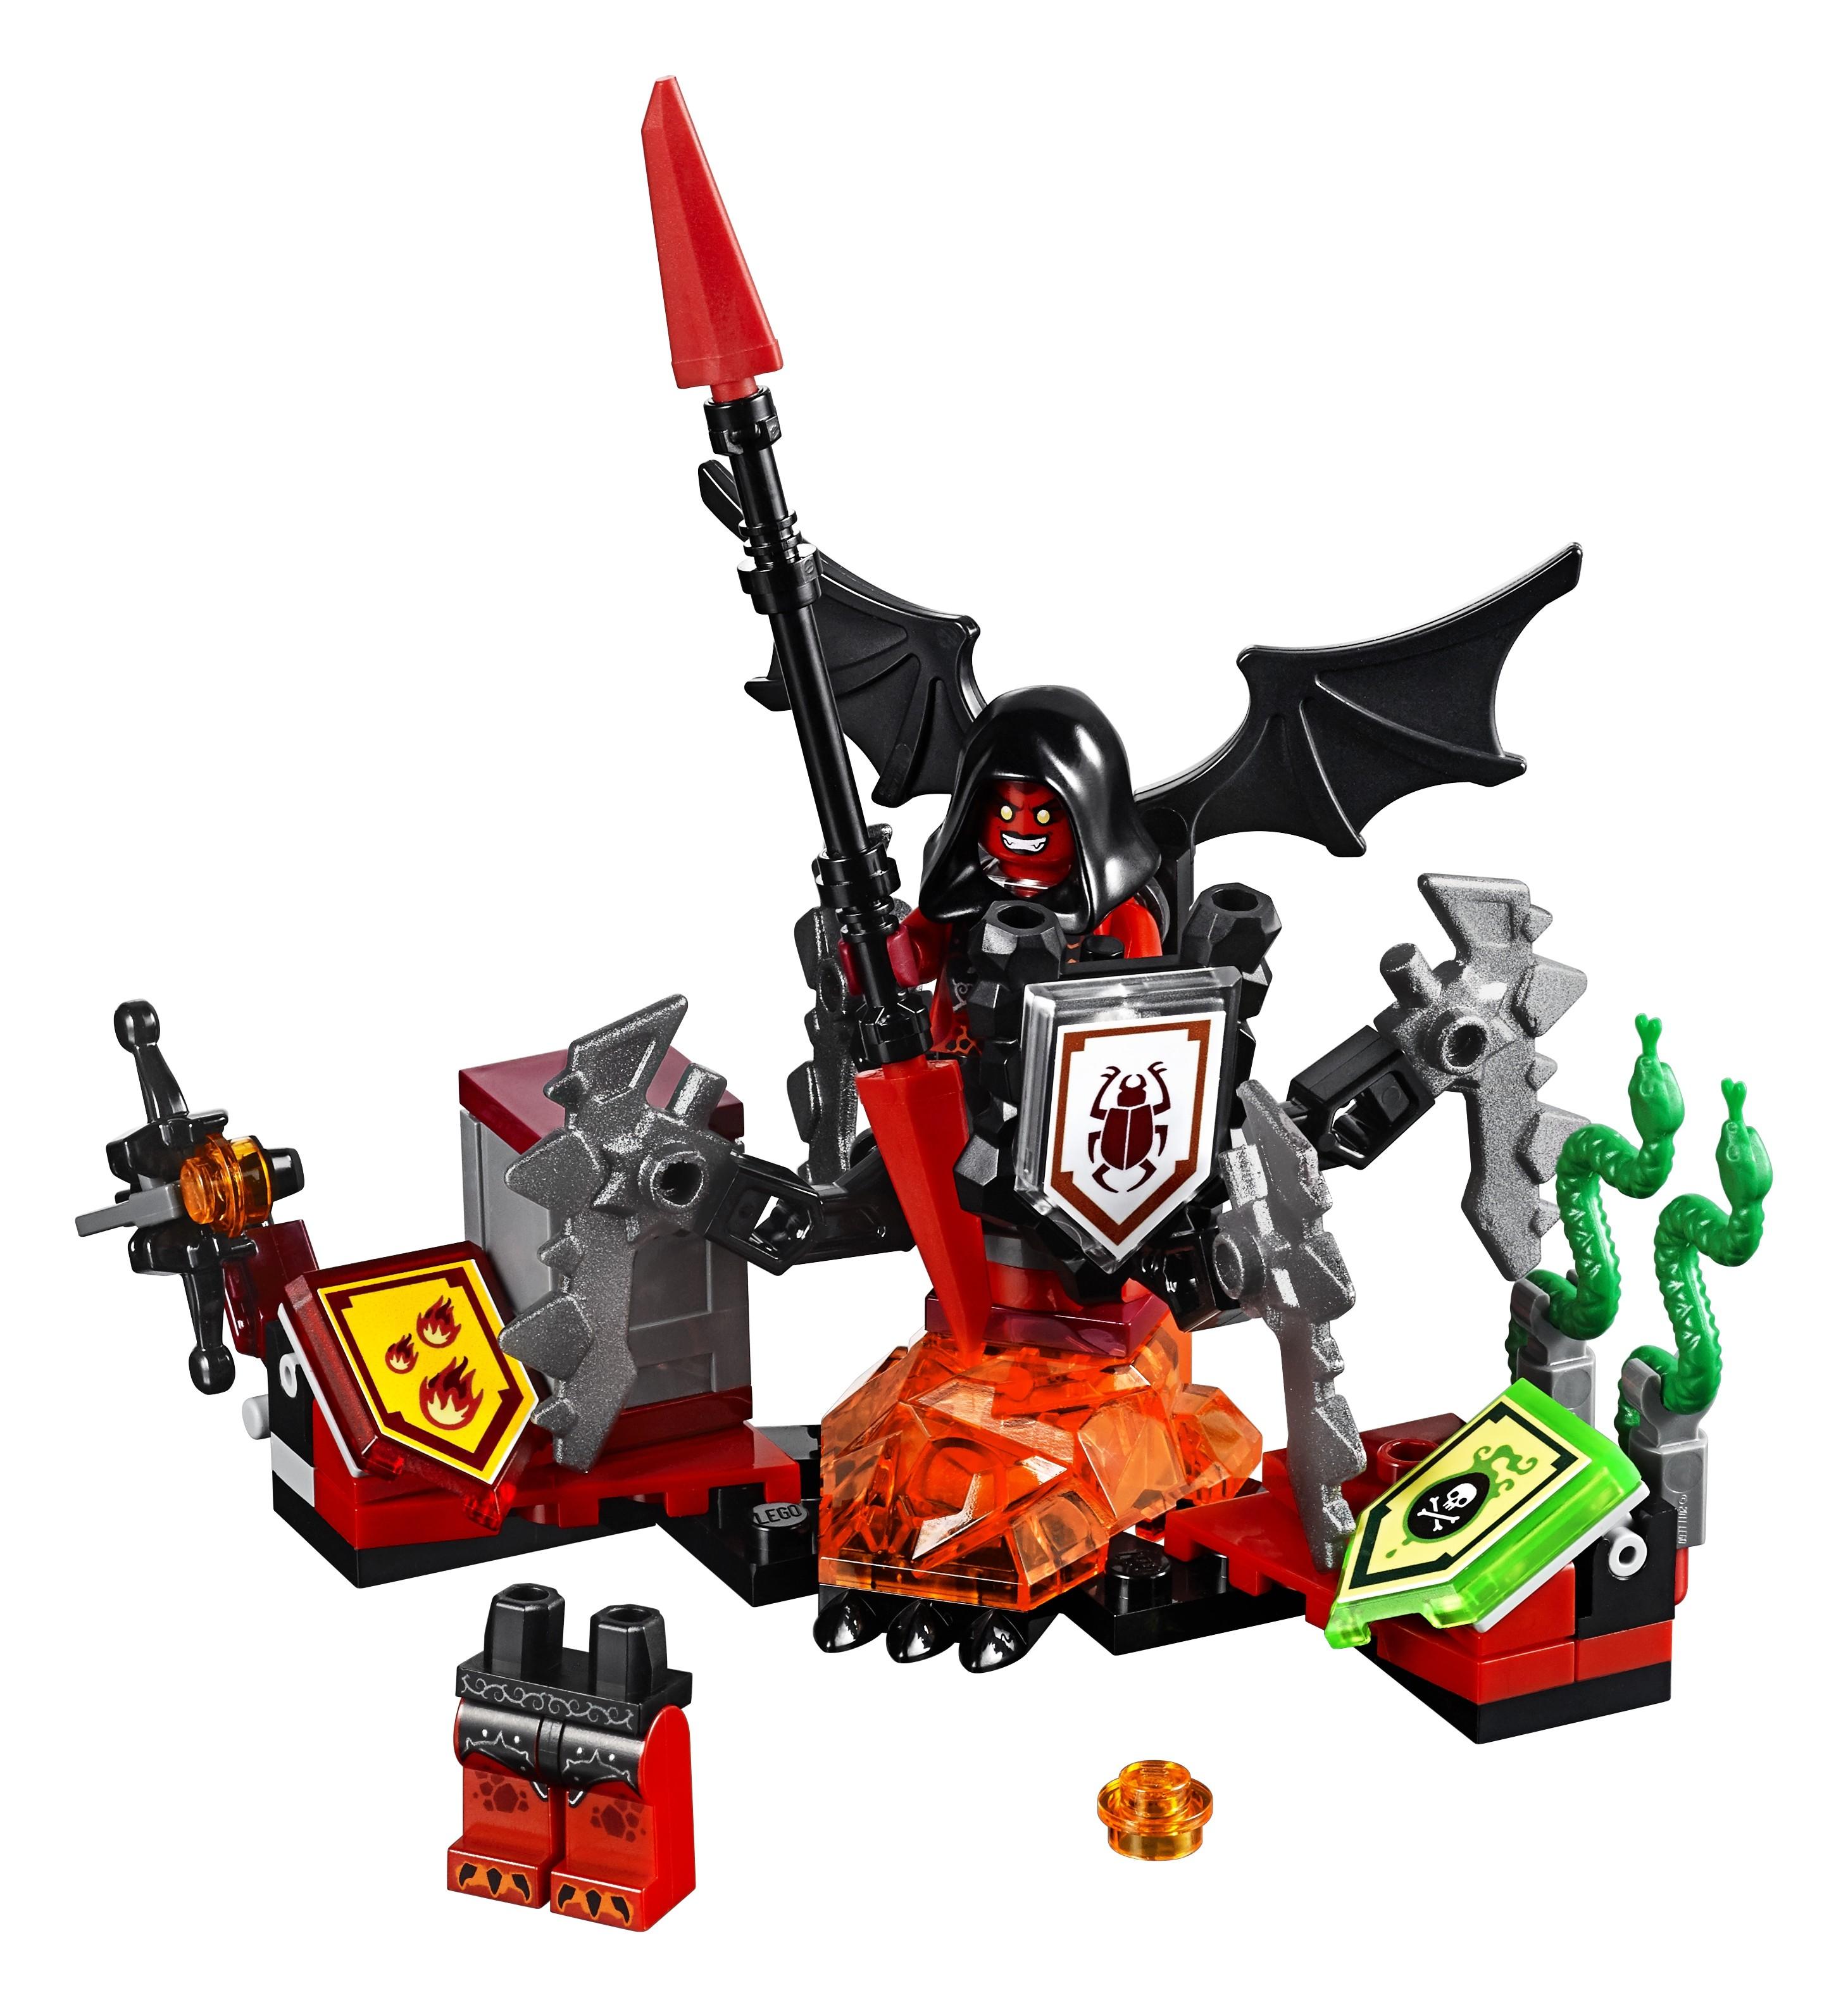 LEGO LEGO Nexo Knights 70335 Лавария Абсолютная сила lepin nexo knights axl glob lobber combination marvel building blocks kits toys compatible legoe nexus